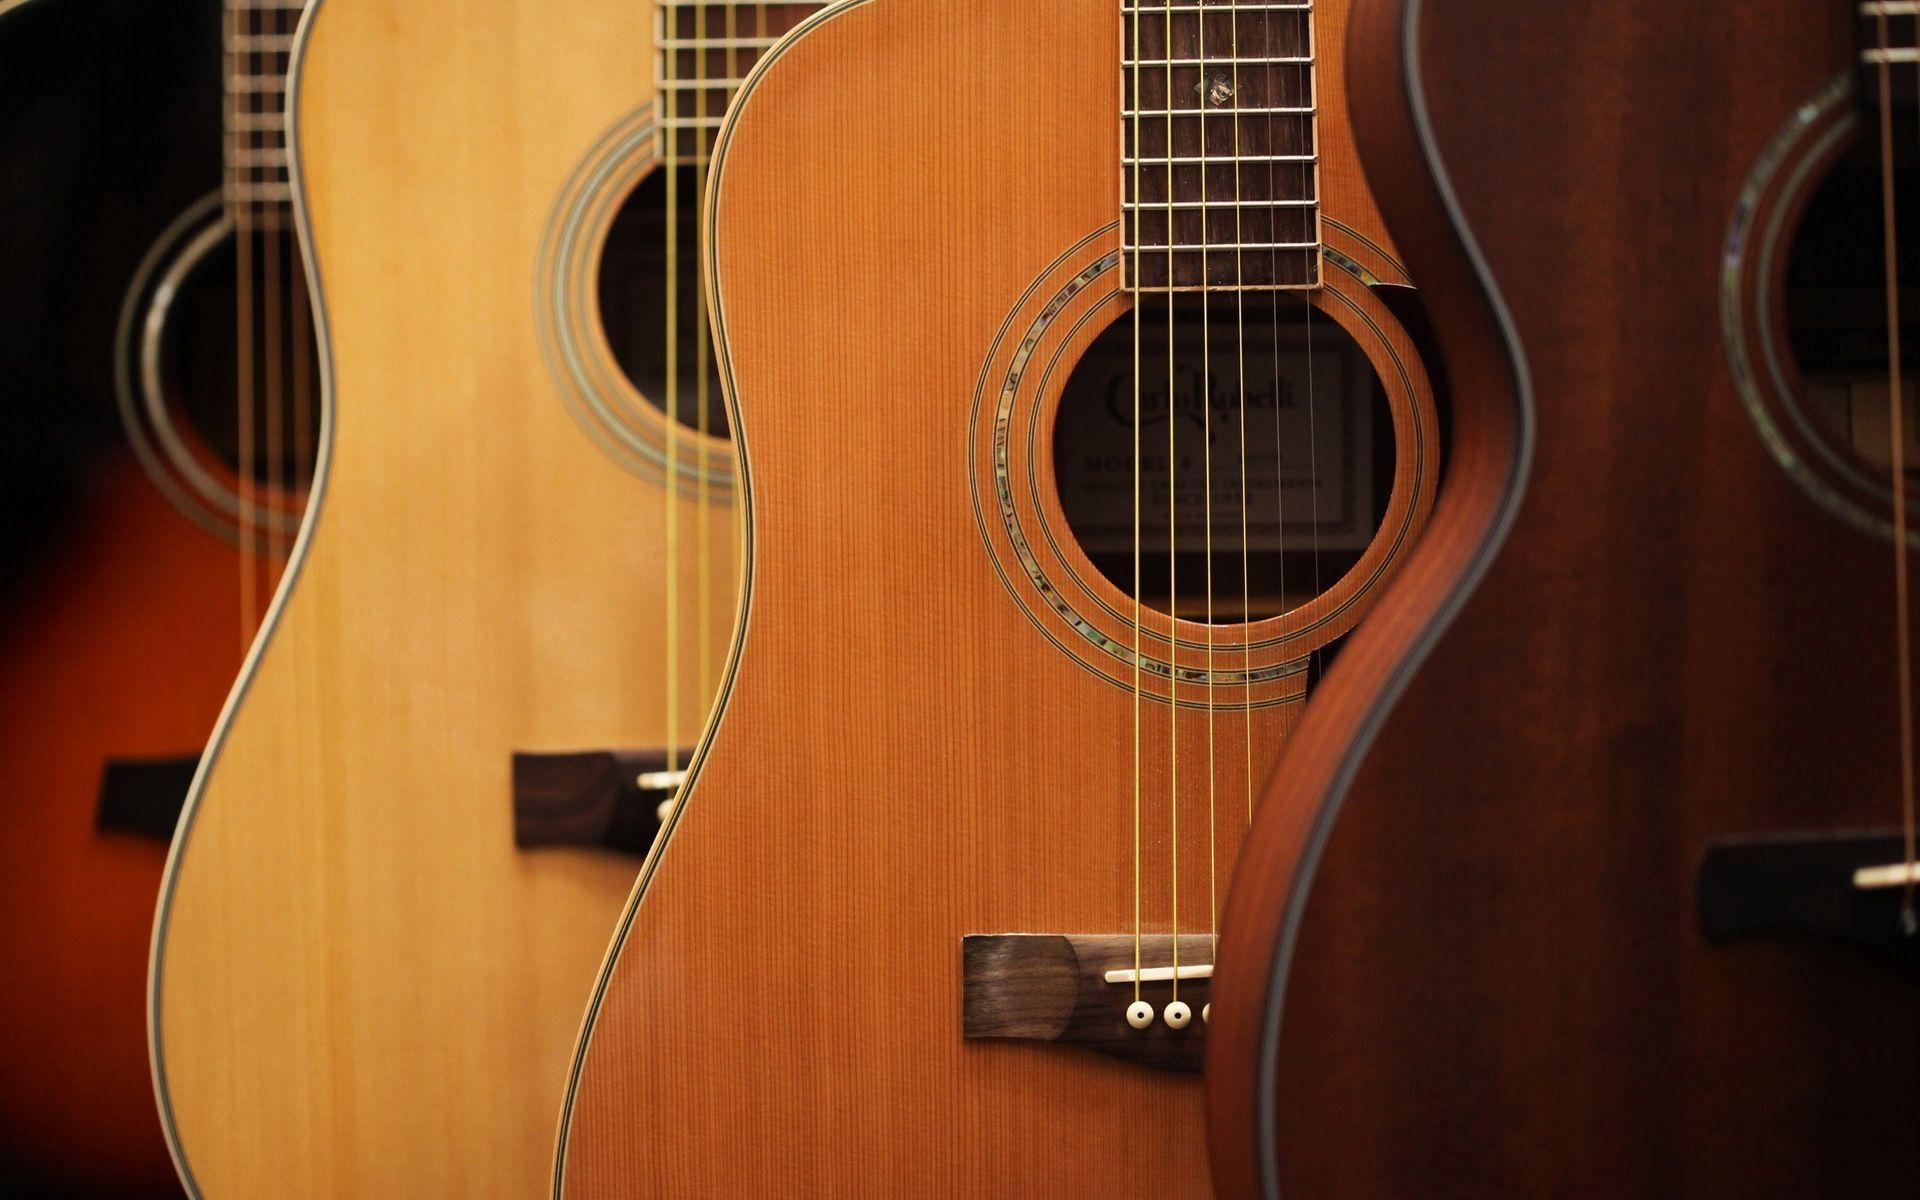 Acoustic Guitars wood, Best Wallpaper